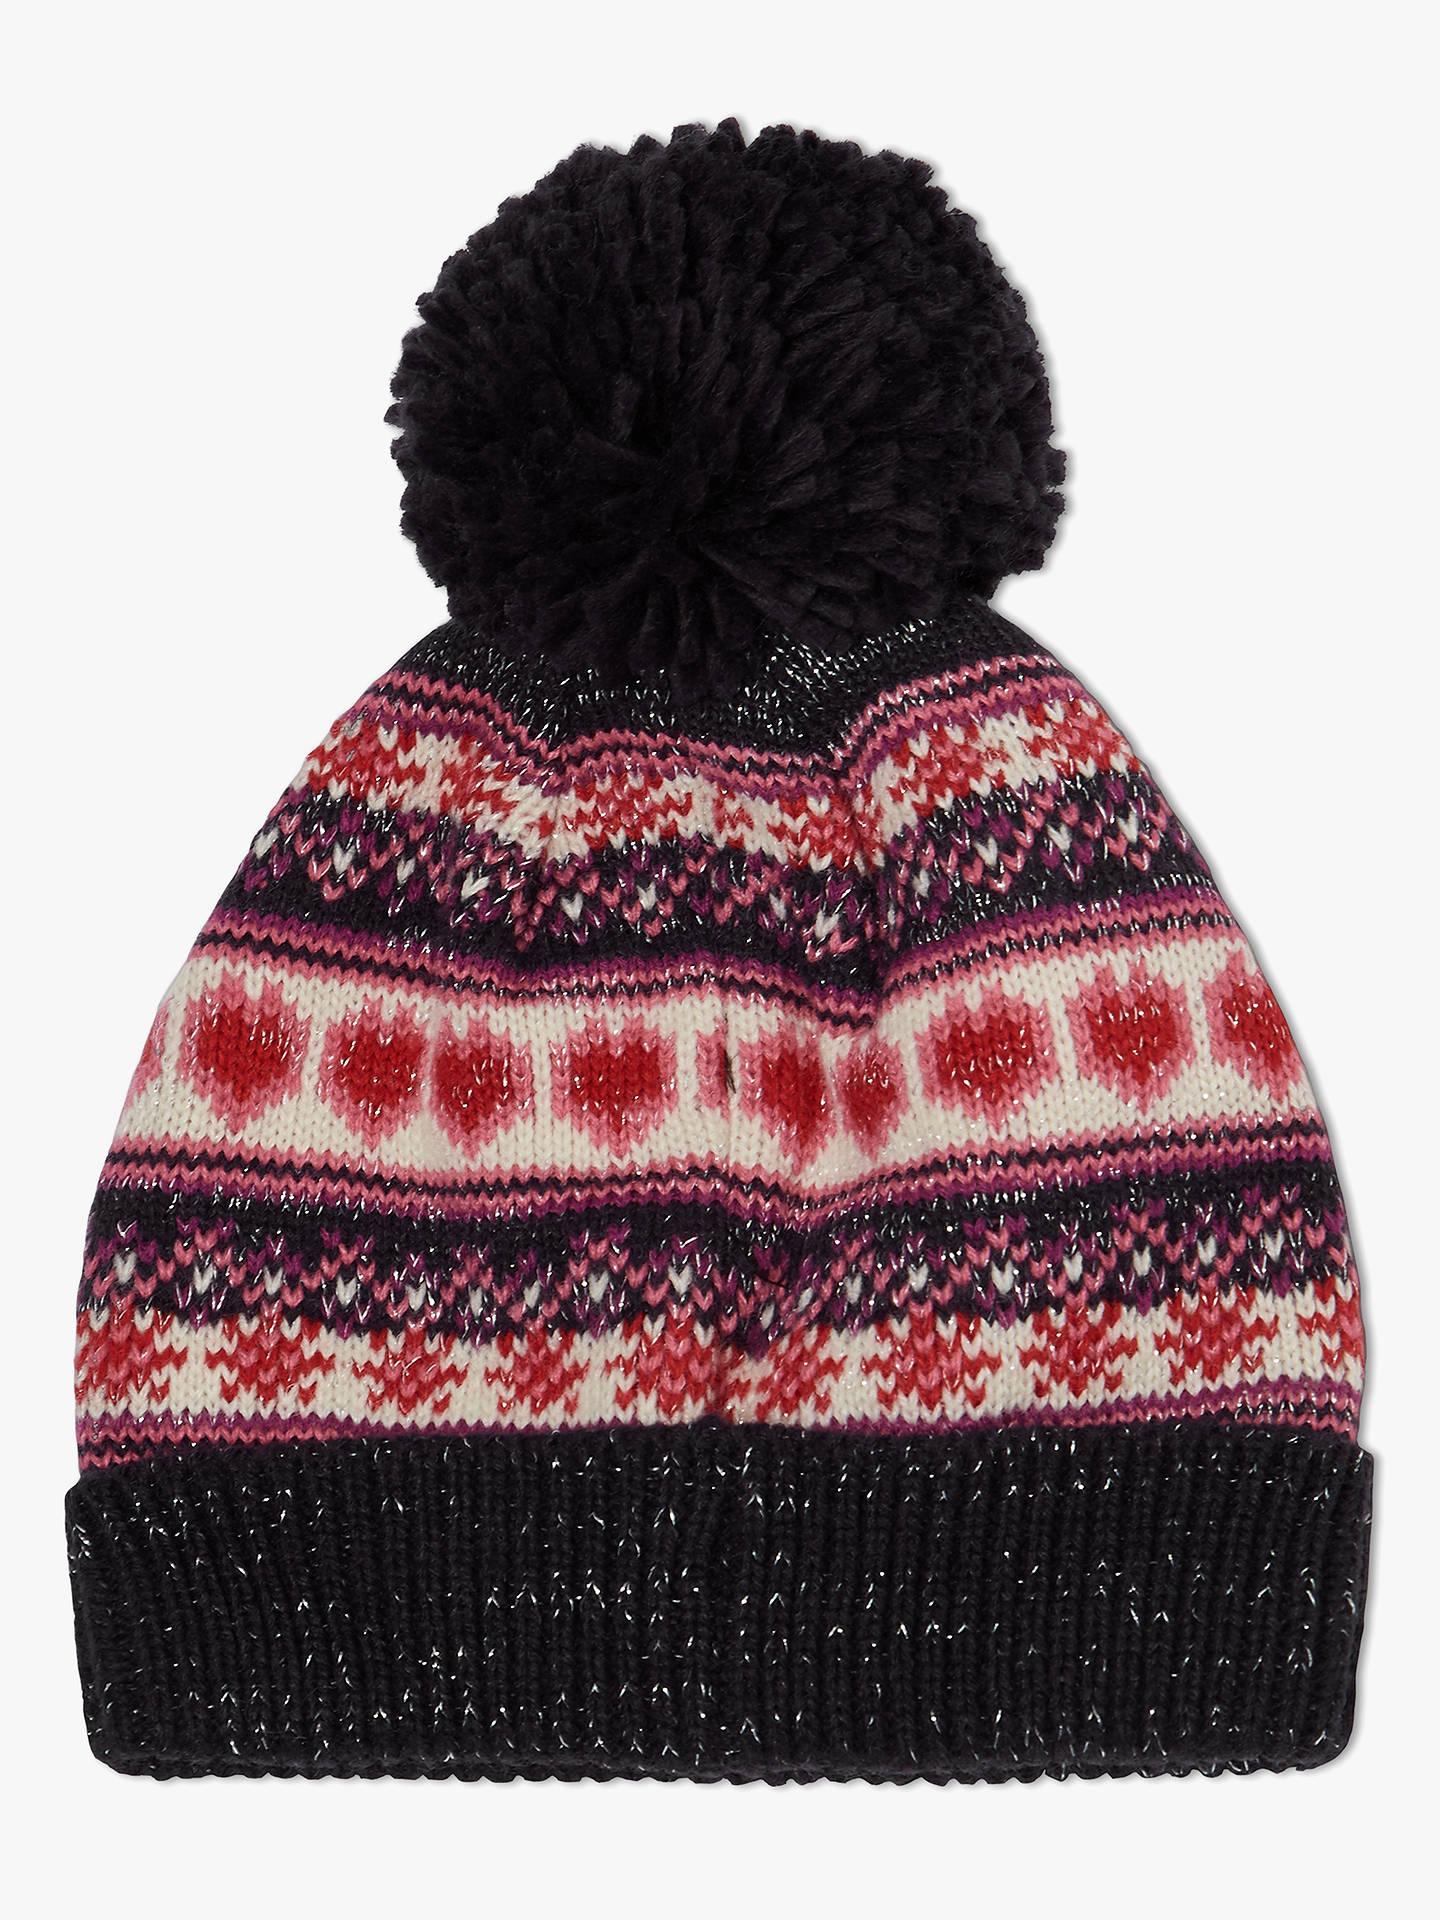 a1bbea0abf33e Buy John Lewis   Partners Children s Christmas Fairisle Glitter Beanie Hat